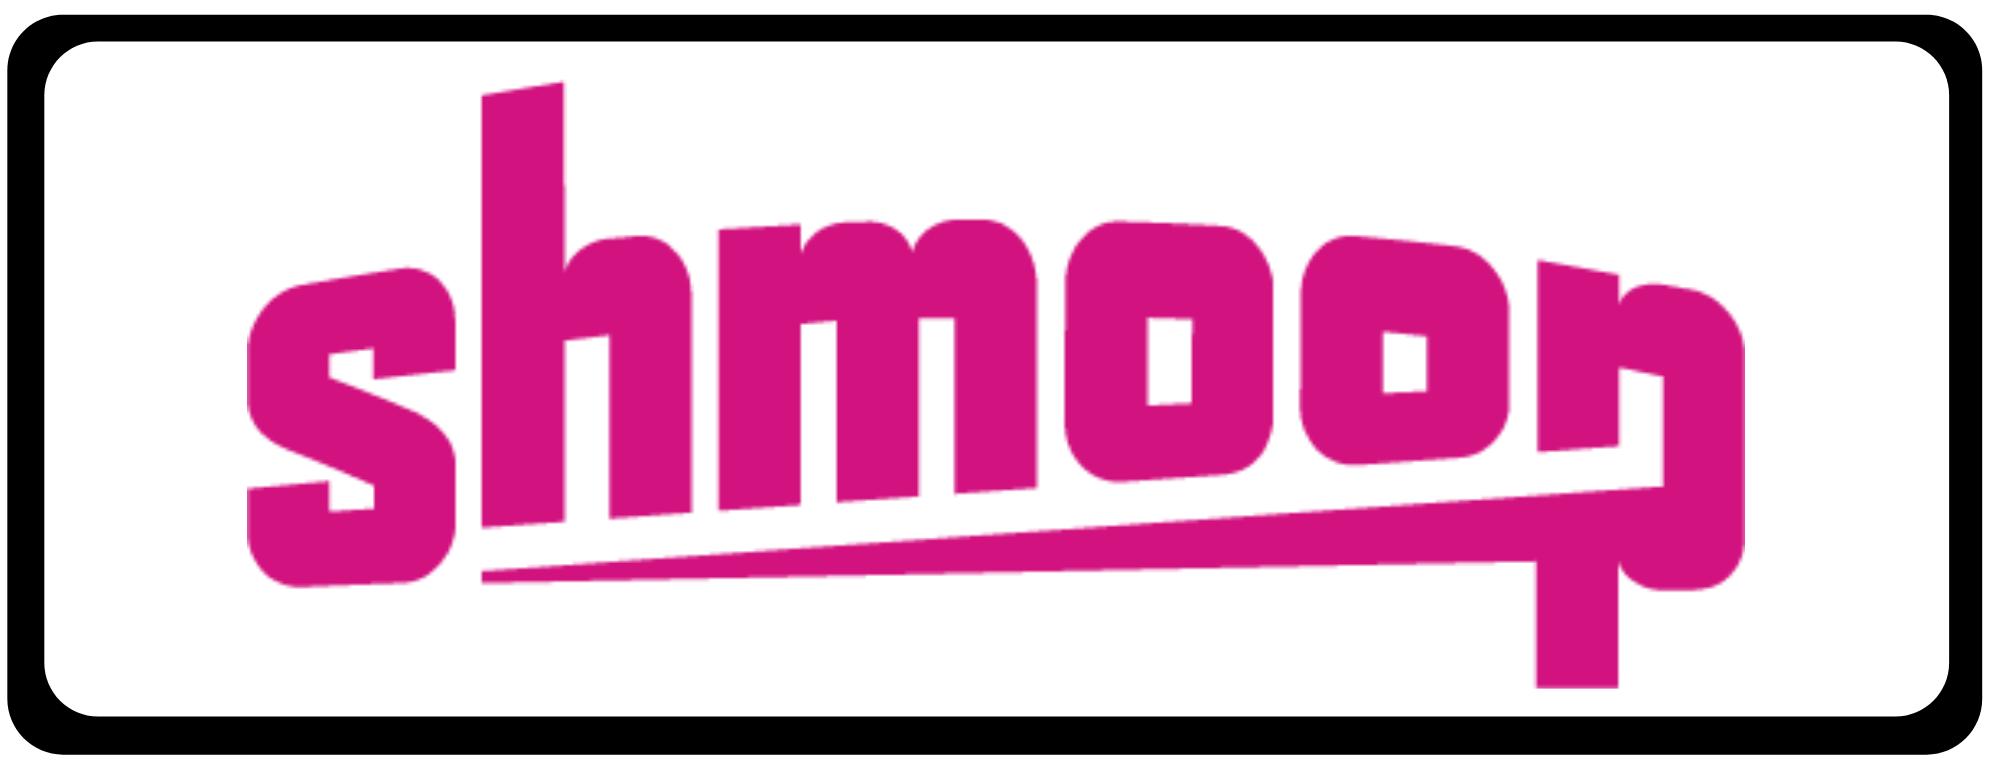 shmop